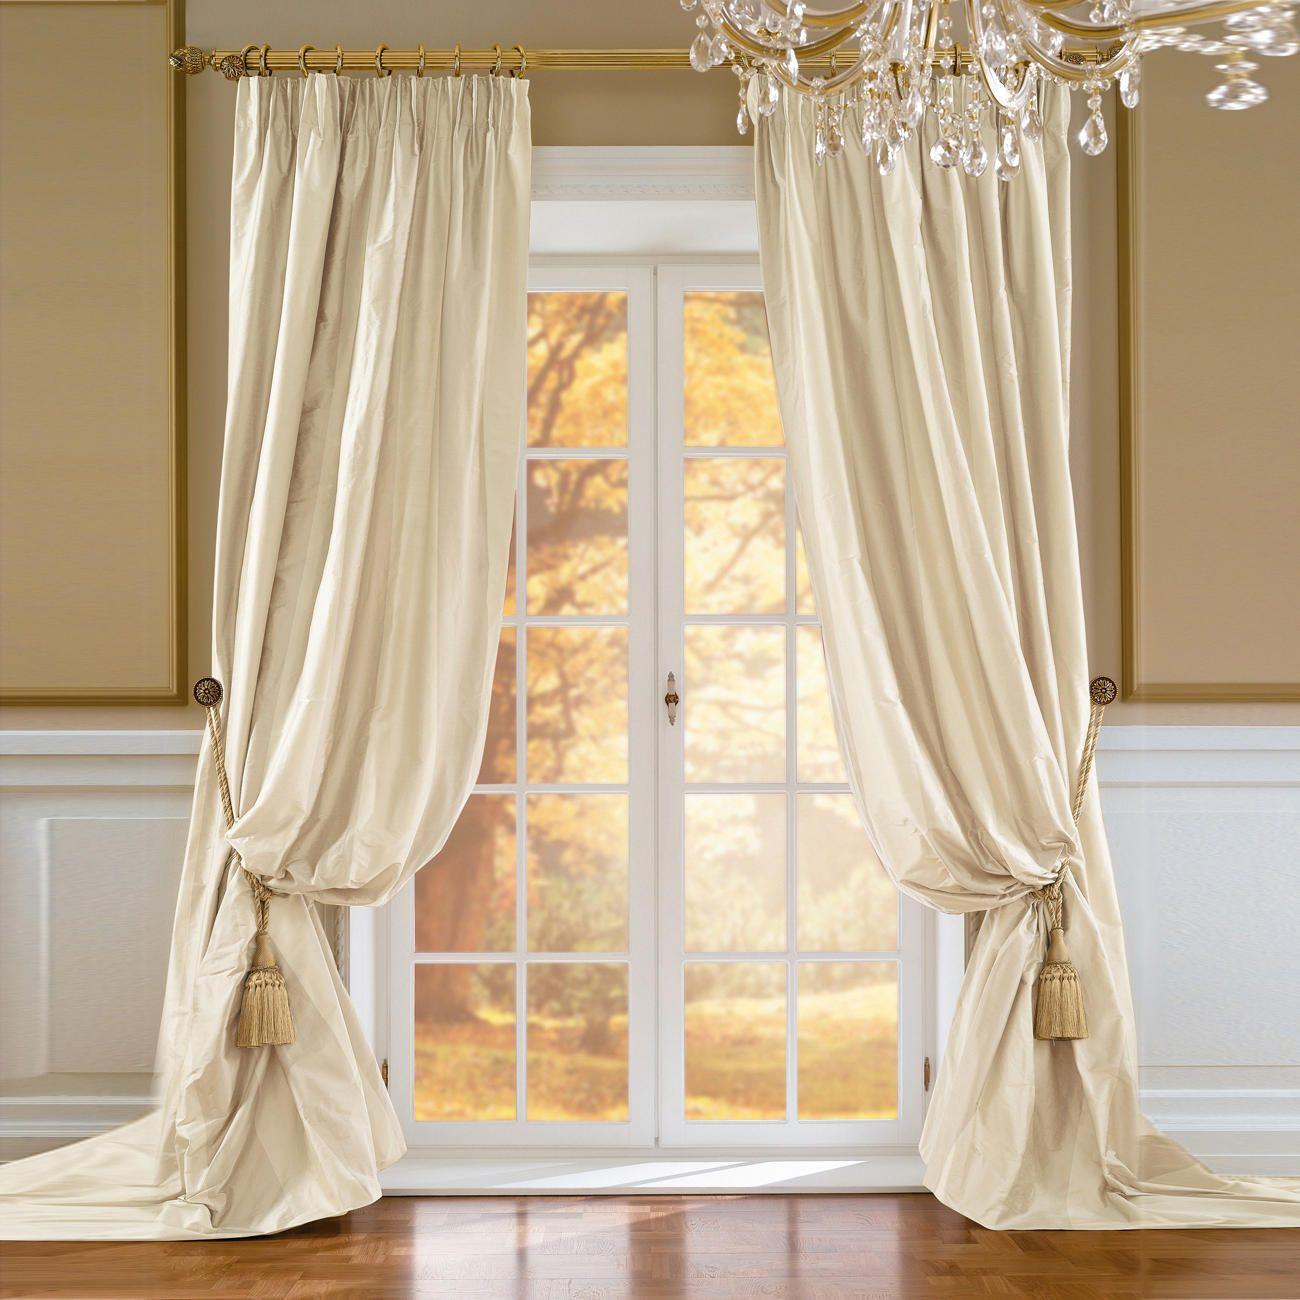 vorhang palmera 1 vorhang kostbare reine doupion seide extra breit gewebt keine st rende. Black Bedroom Furniture Sets. Home Design Ideas